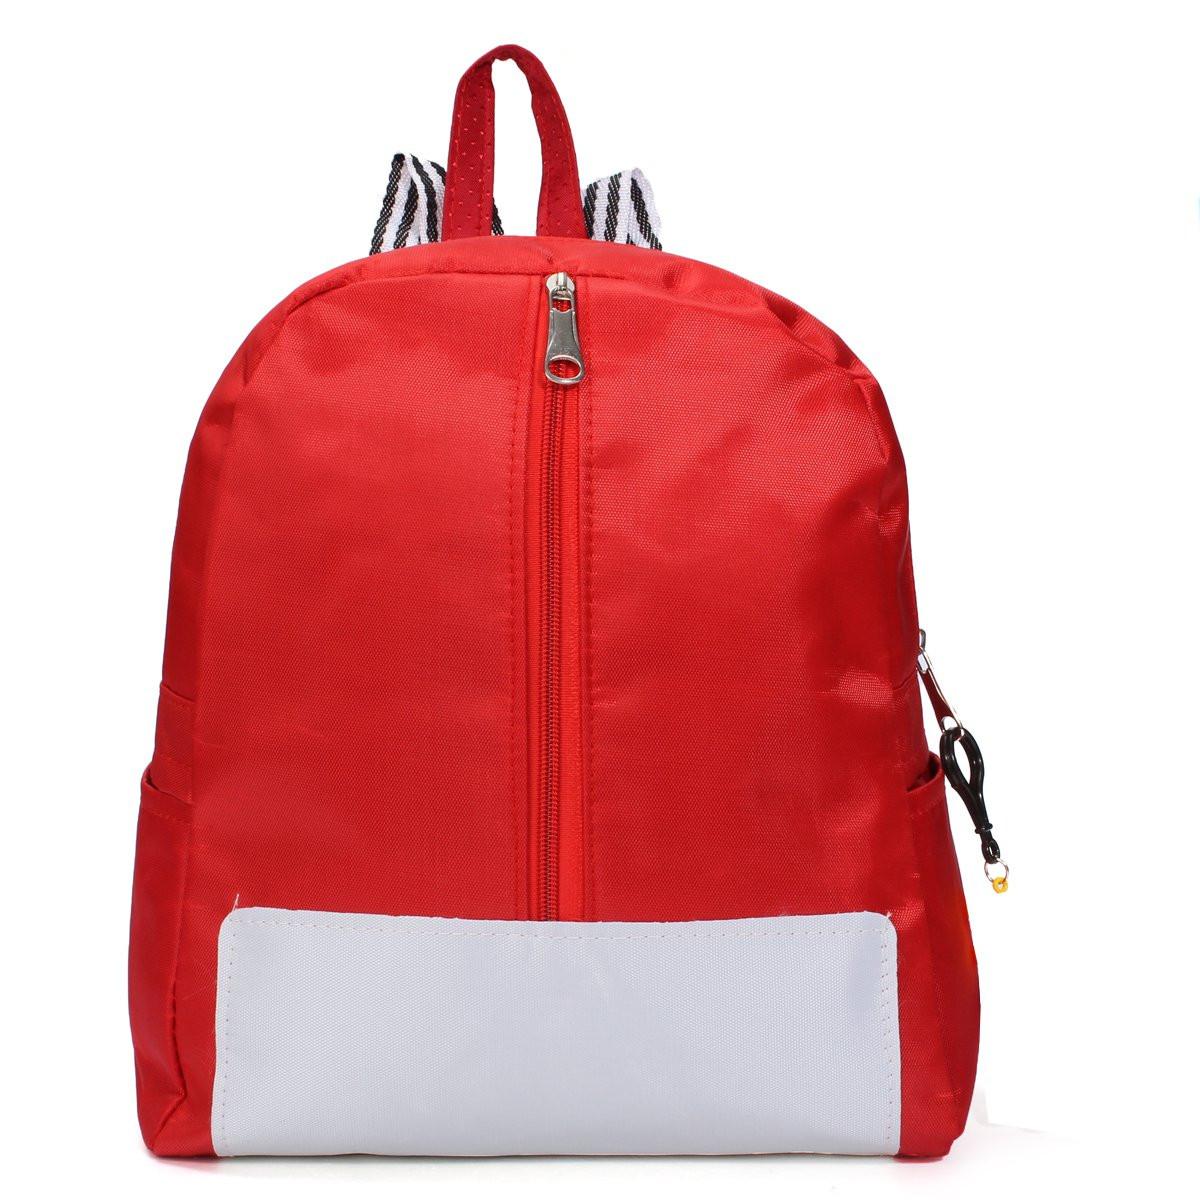 School bag for girl - Image